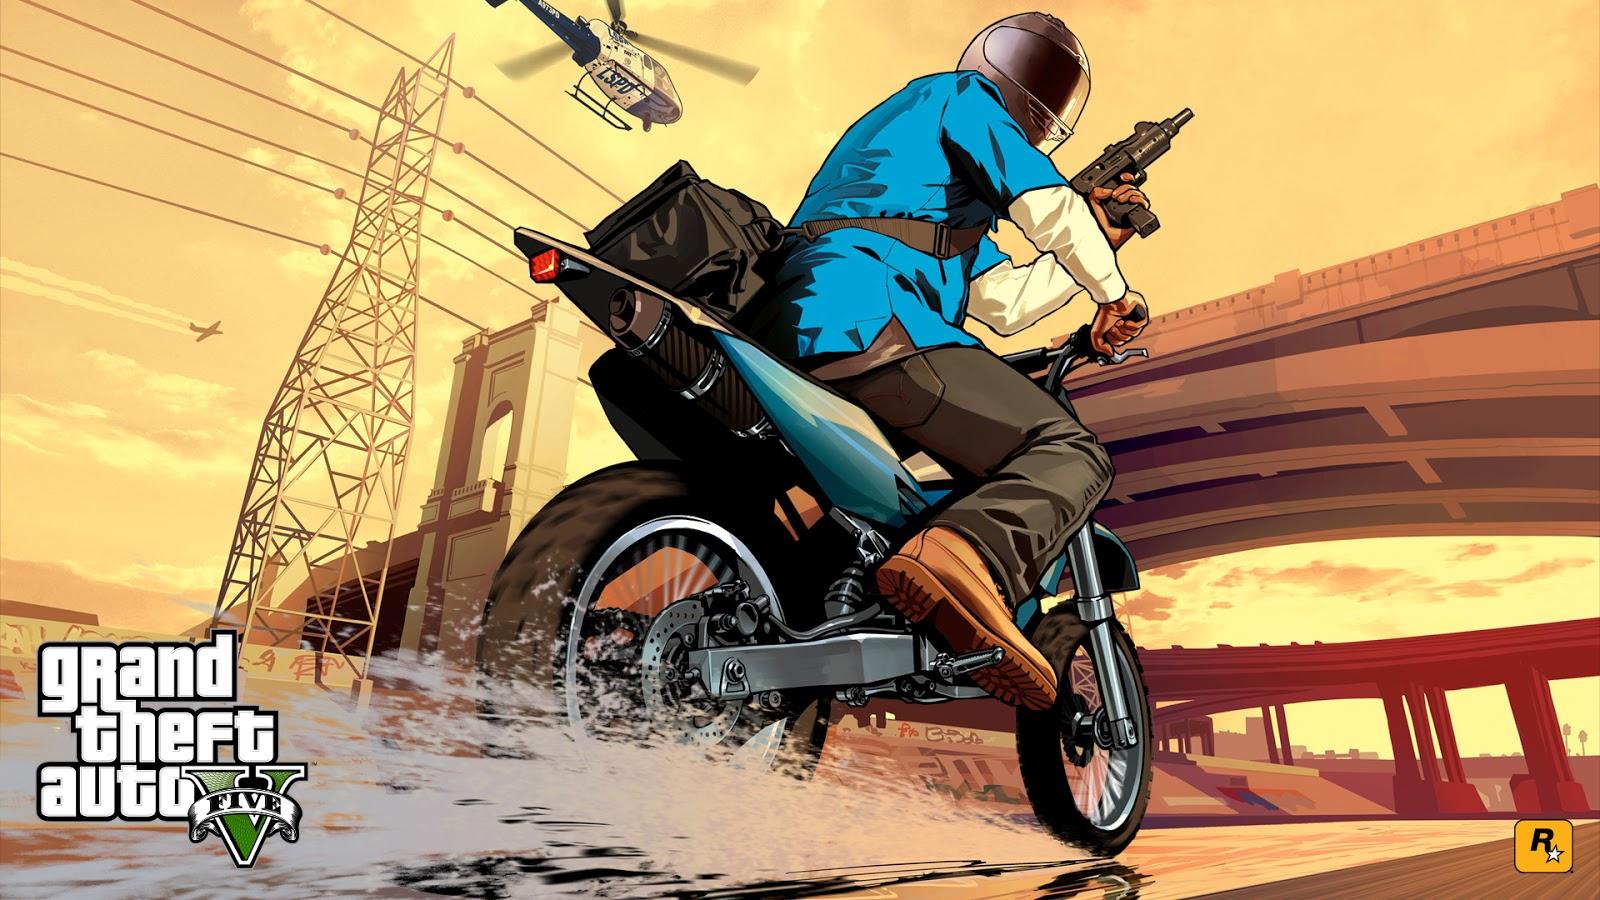 DaeTube: GTA V HD Wallpaper Desktop Background Sceenshoot Game (GTA 5)